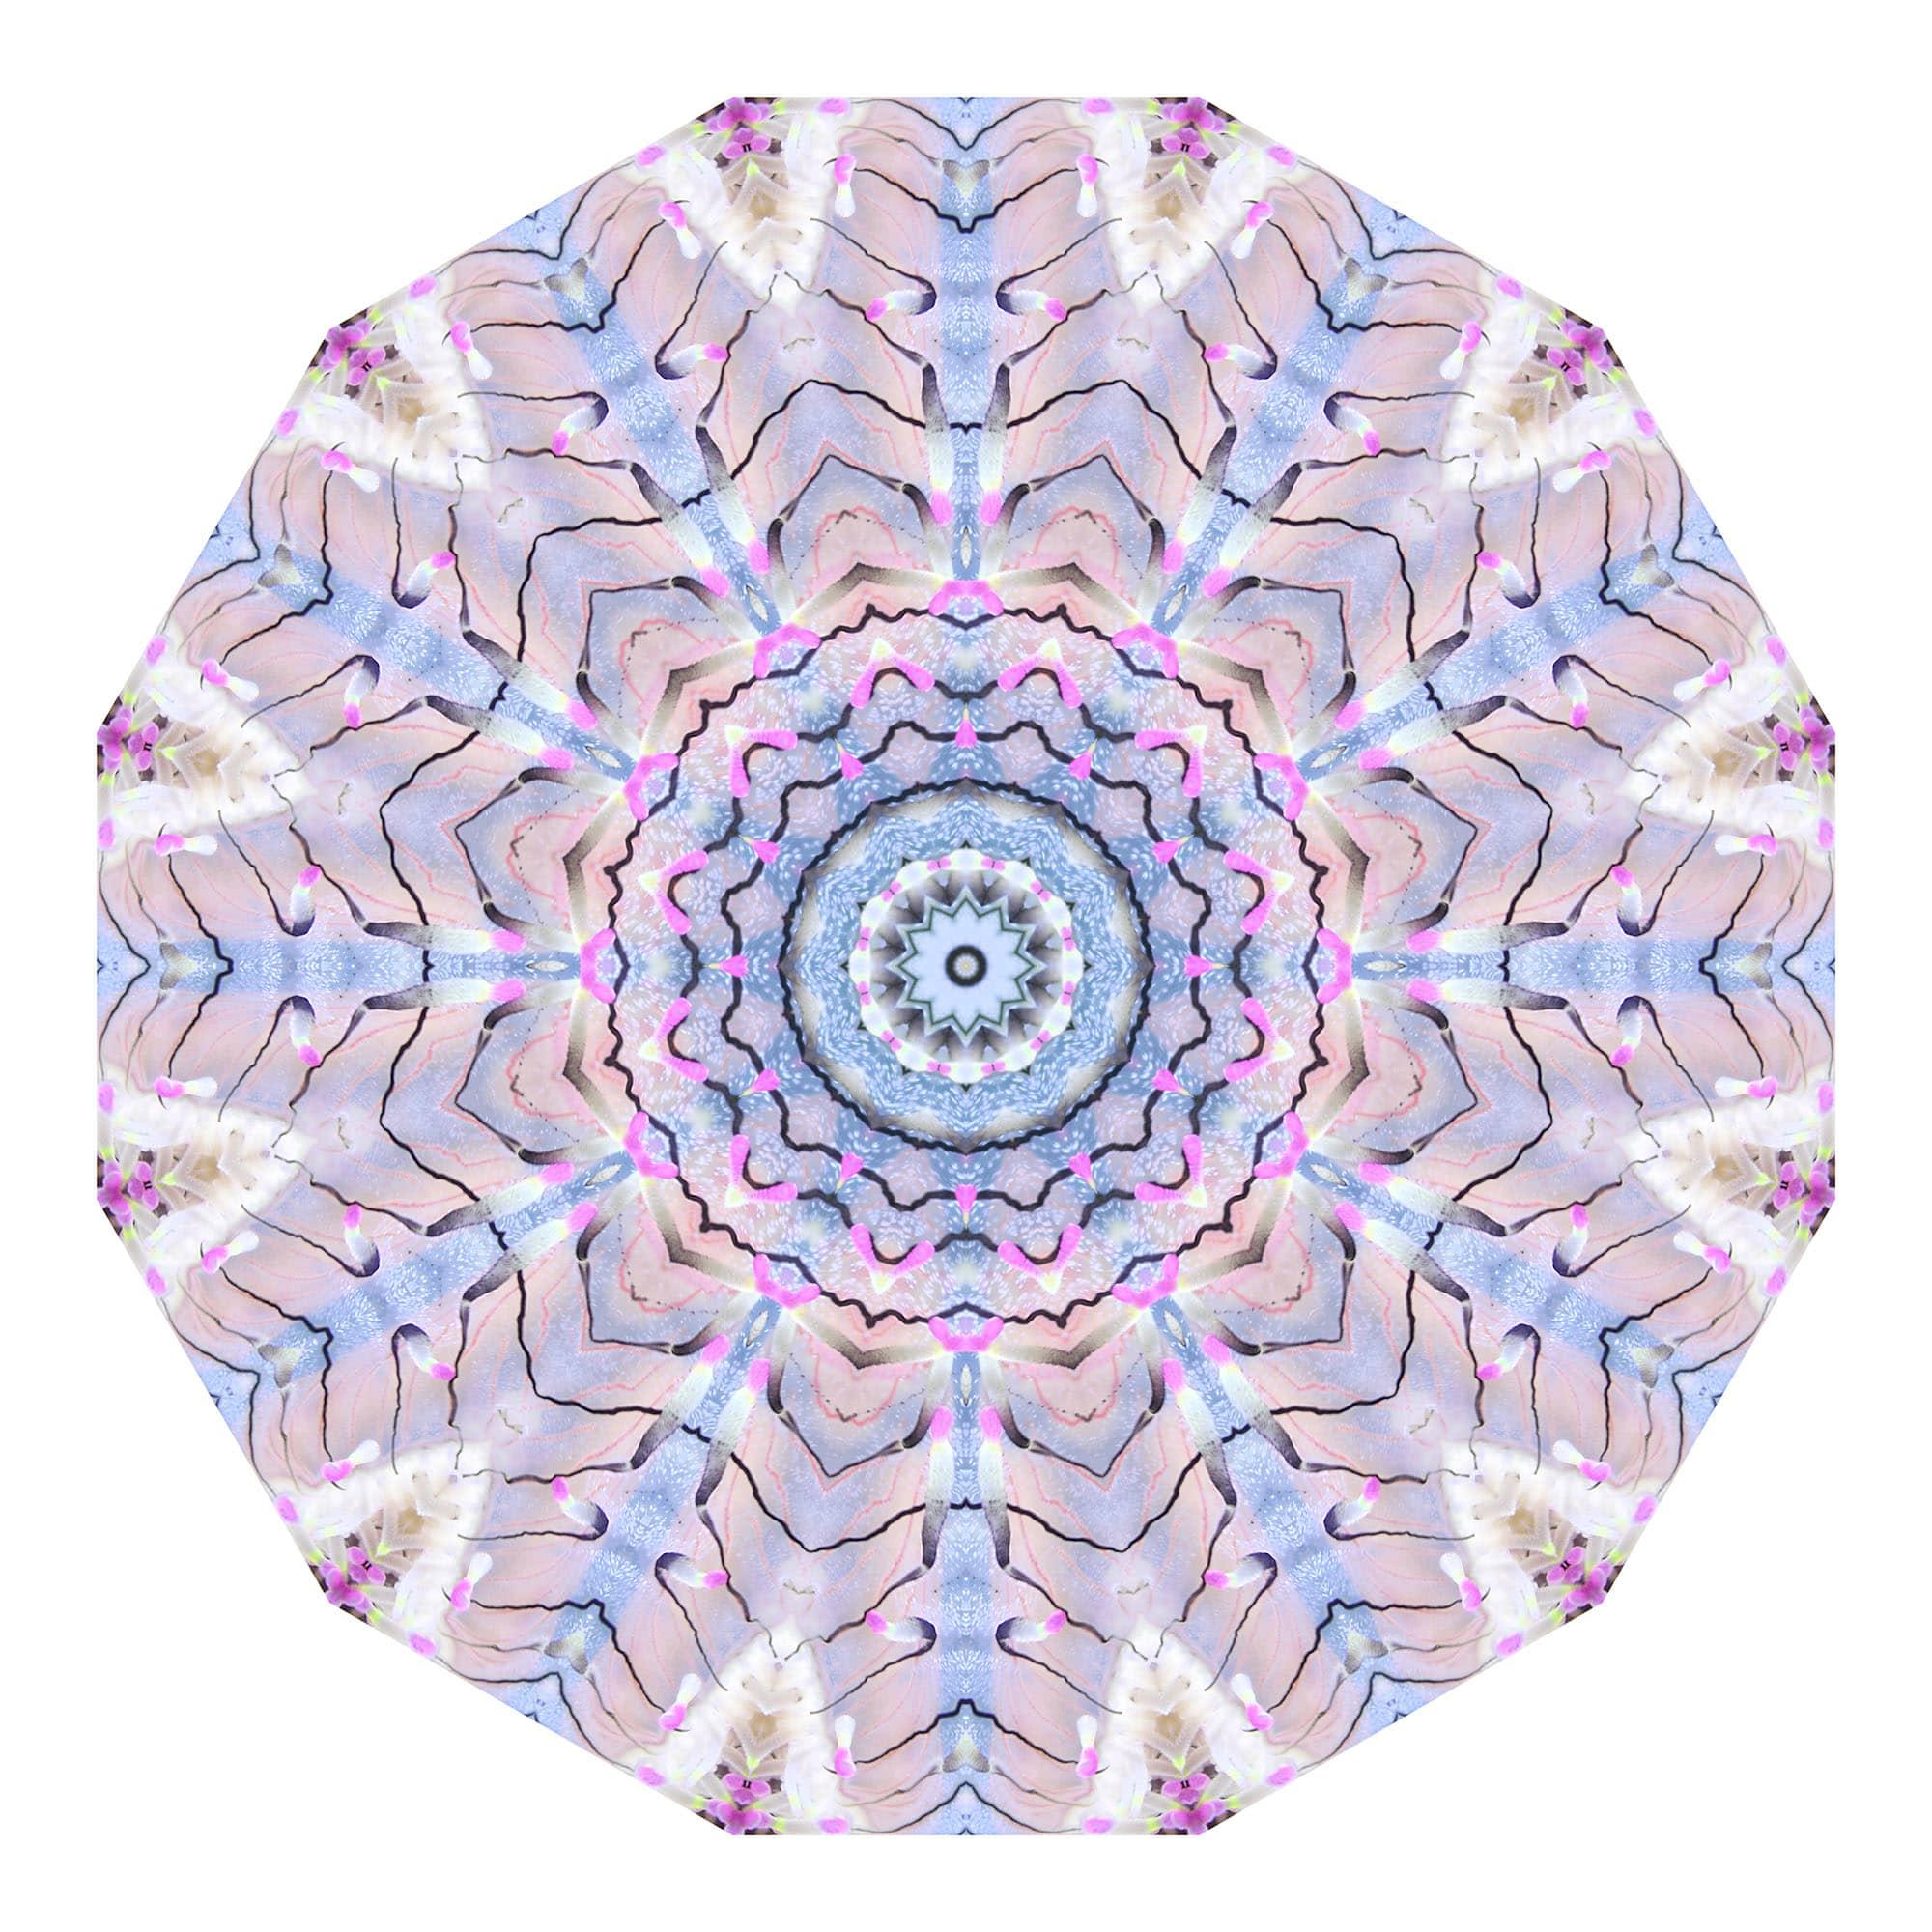 Jellyfish 01